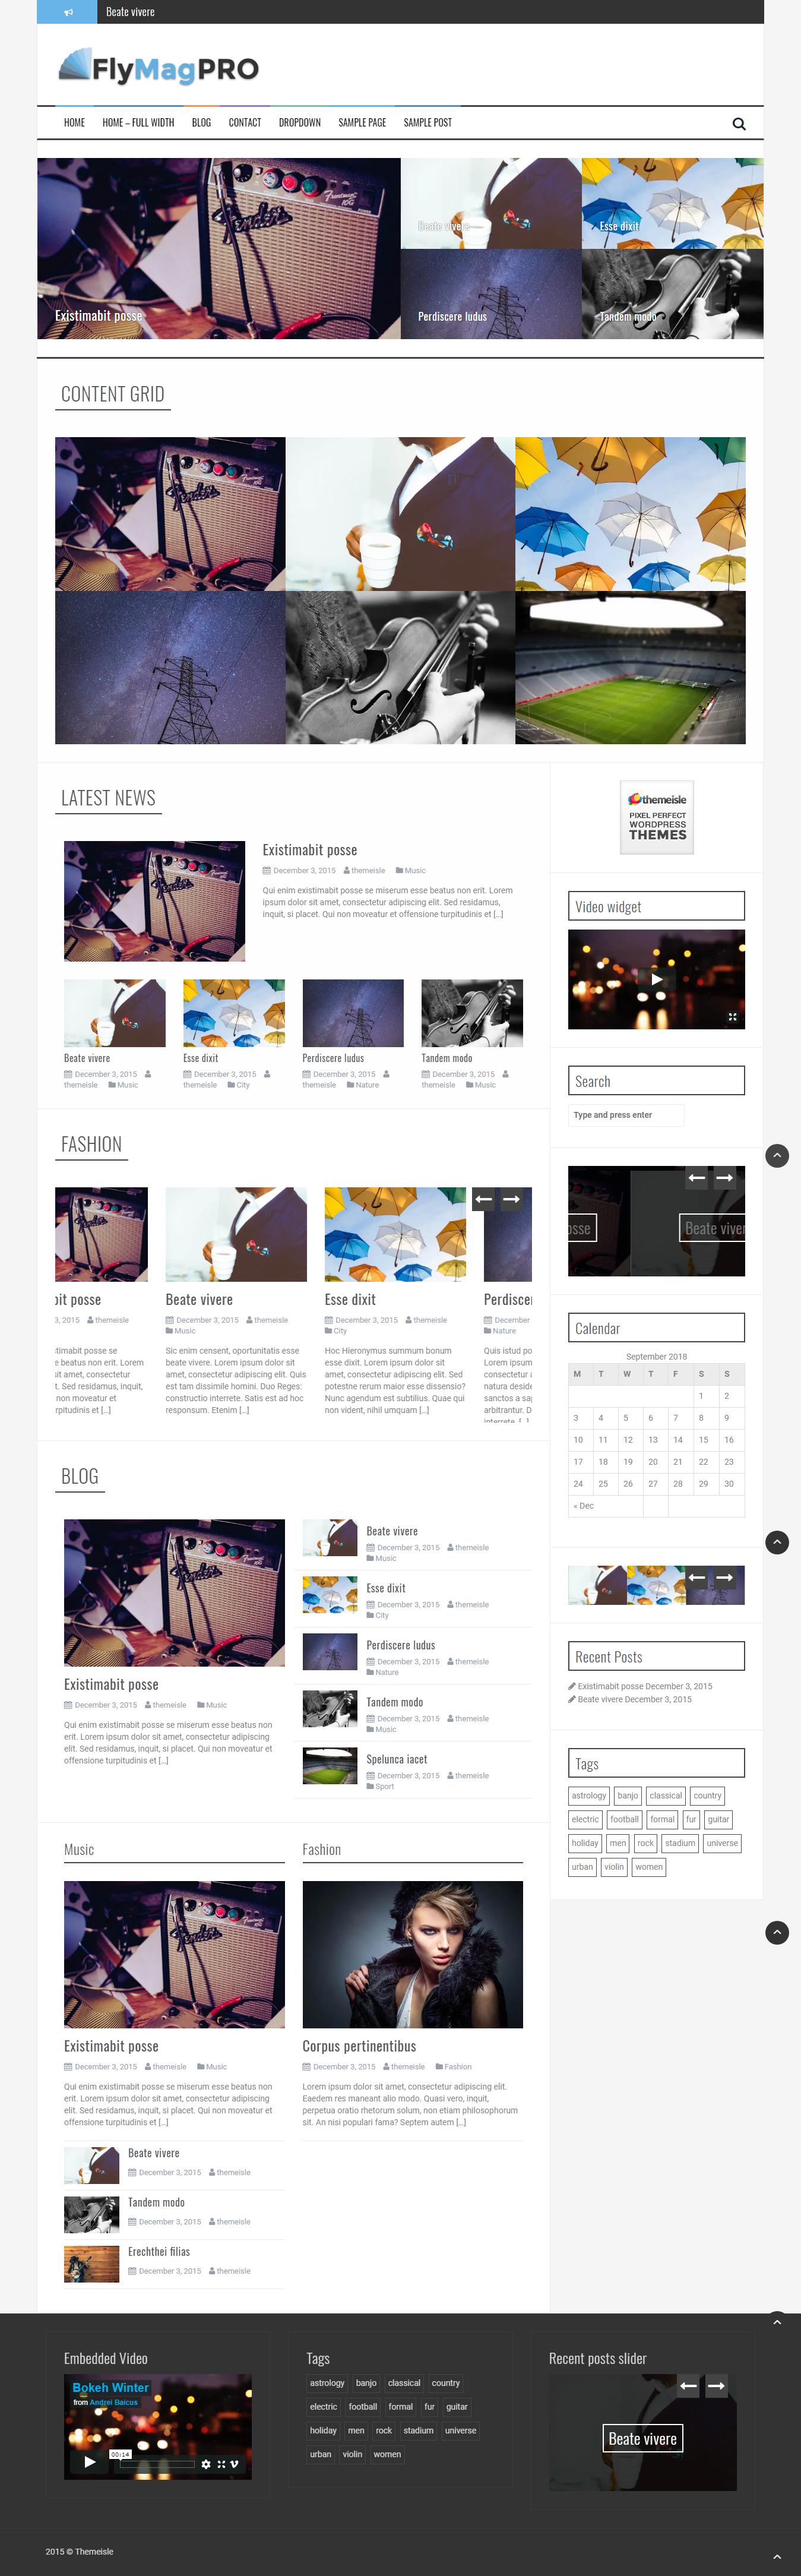 Flymag Pro- Best Premium Responsive WordPress Theme